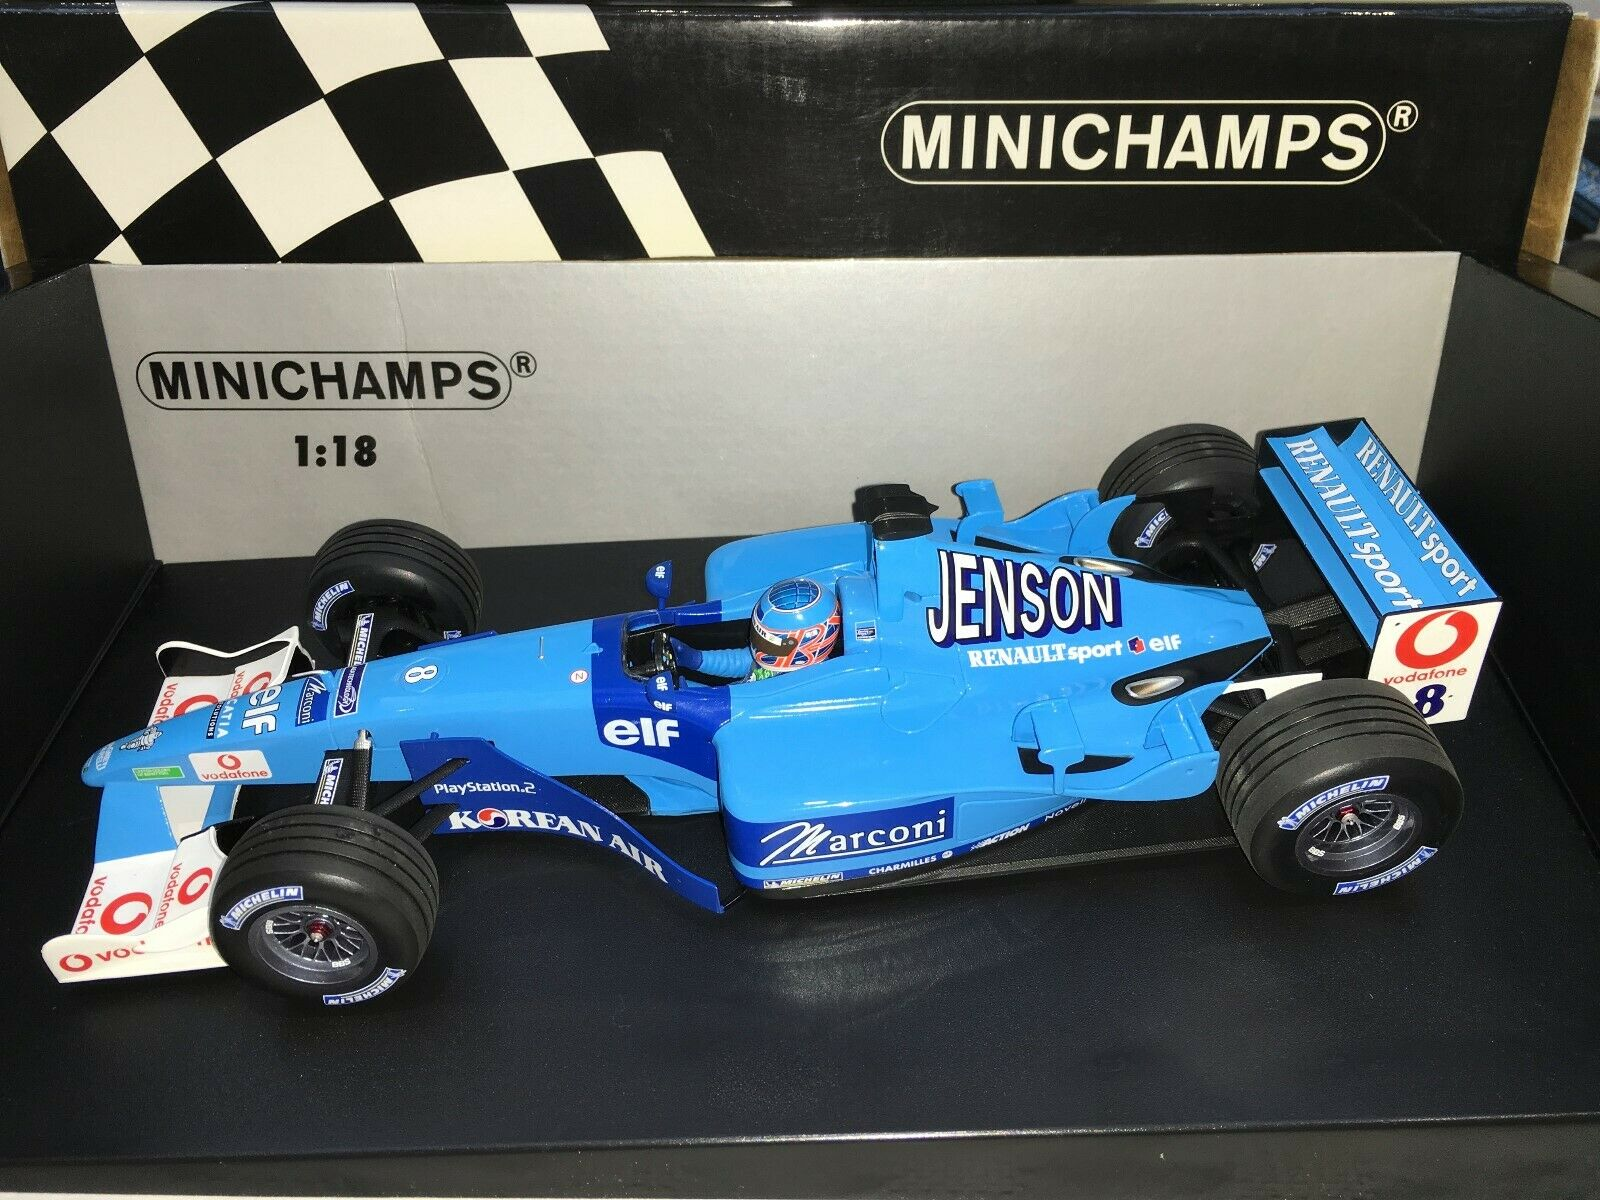 1 18 Minichamps  100 010008 Jenson Button Benetton Renault Sport  8 B201 2001